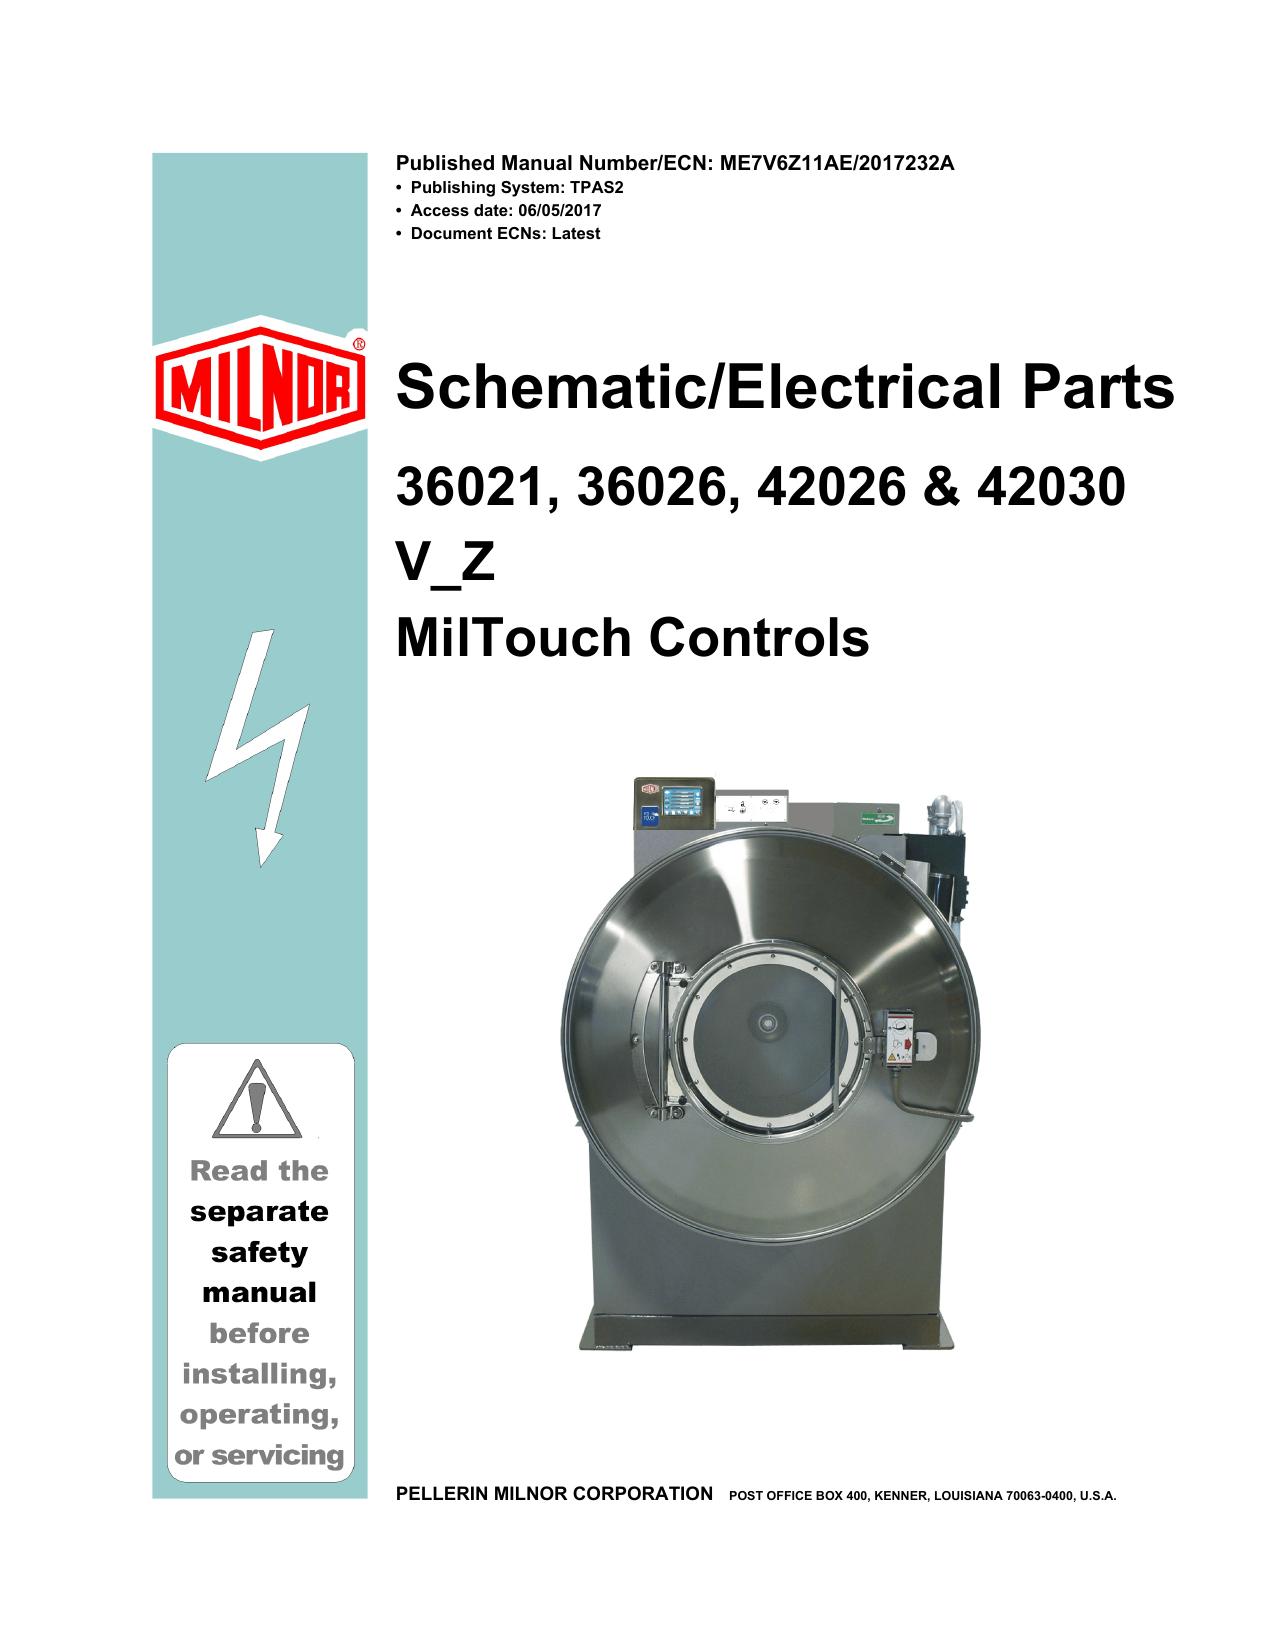 schematic electrical parts pellerin milnor corporation rh studyres com